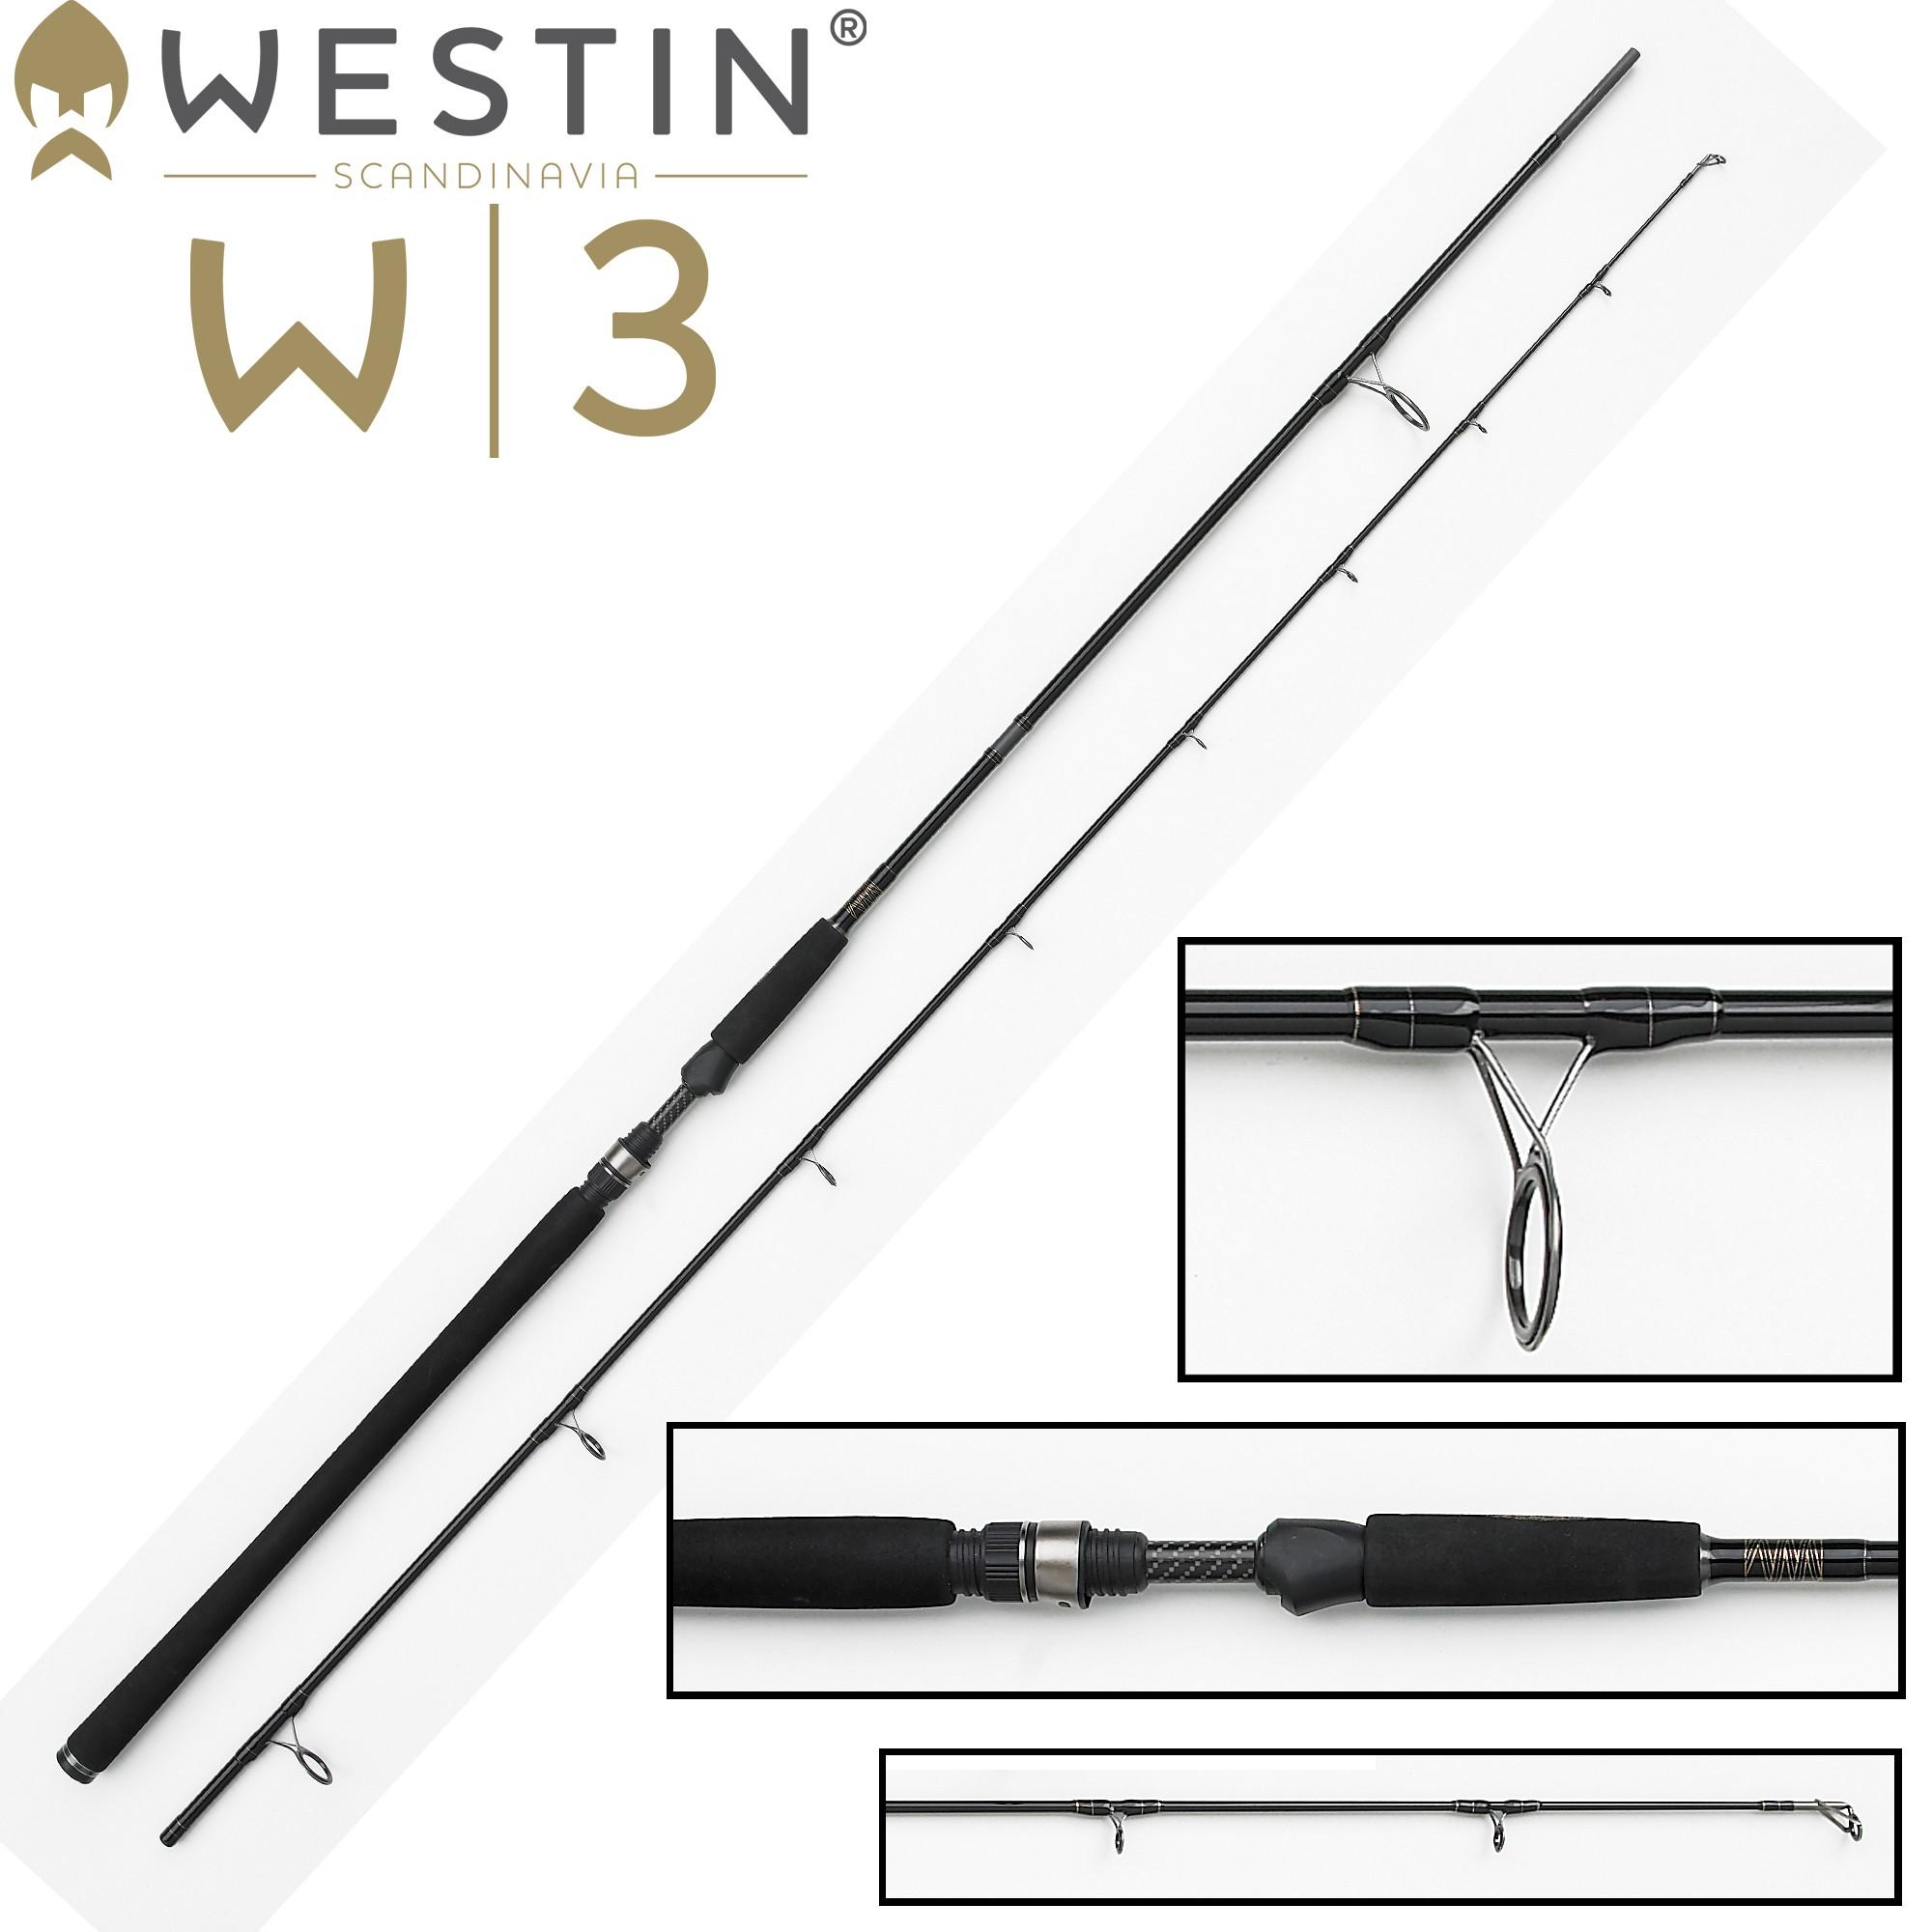 W3 Powercast 278cm XH 20-80g Spinnrute